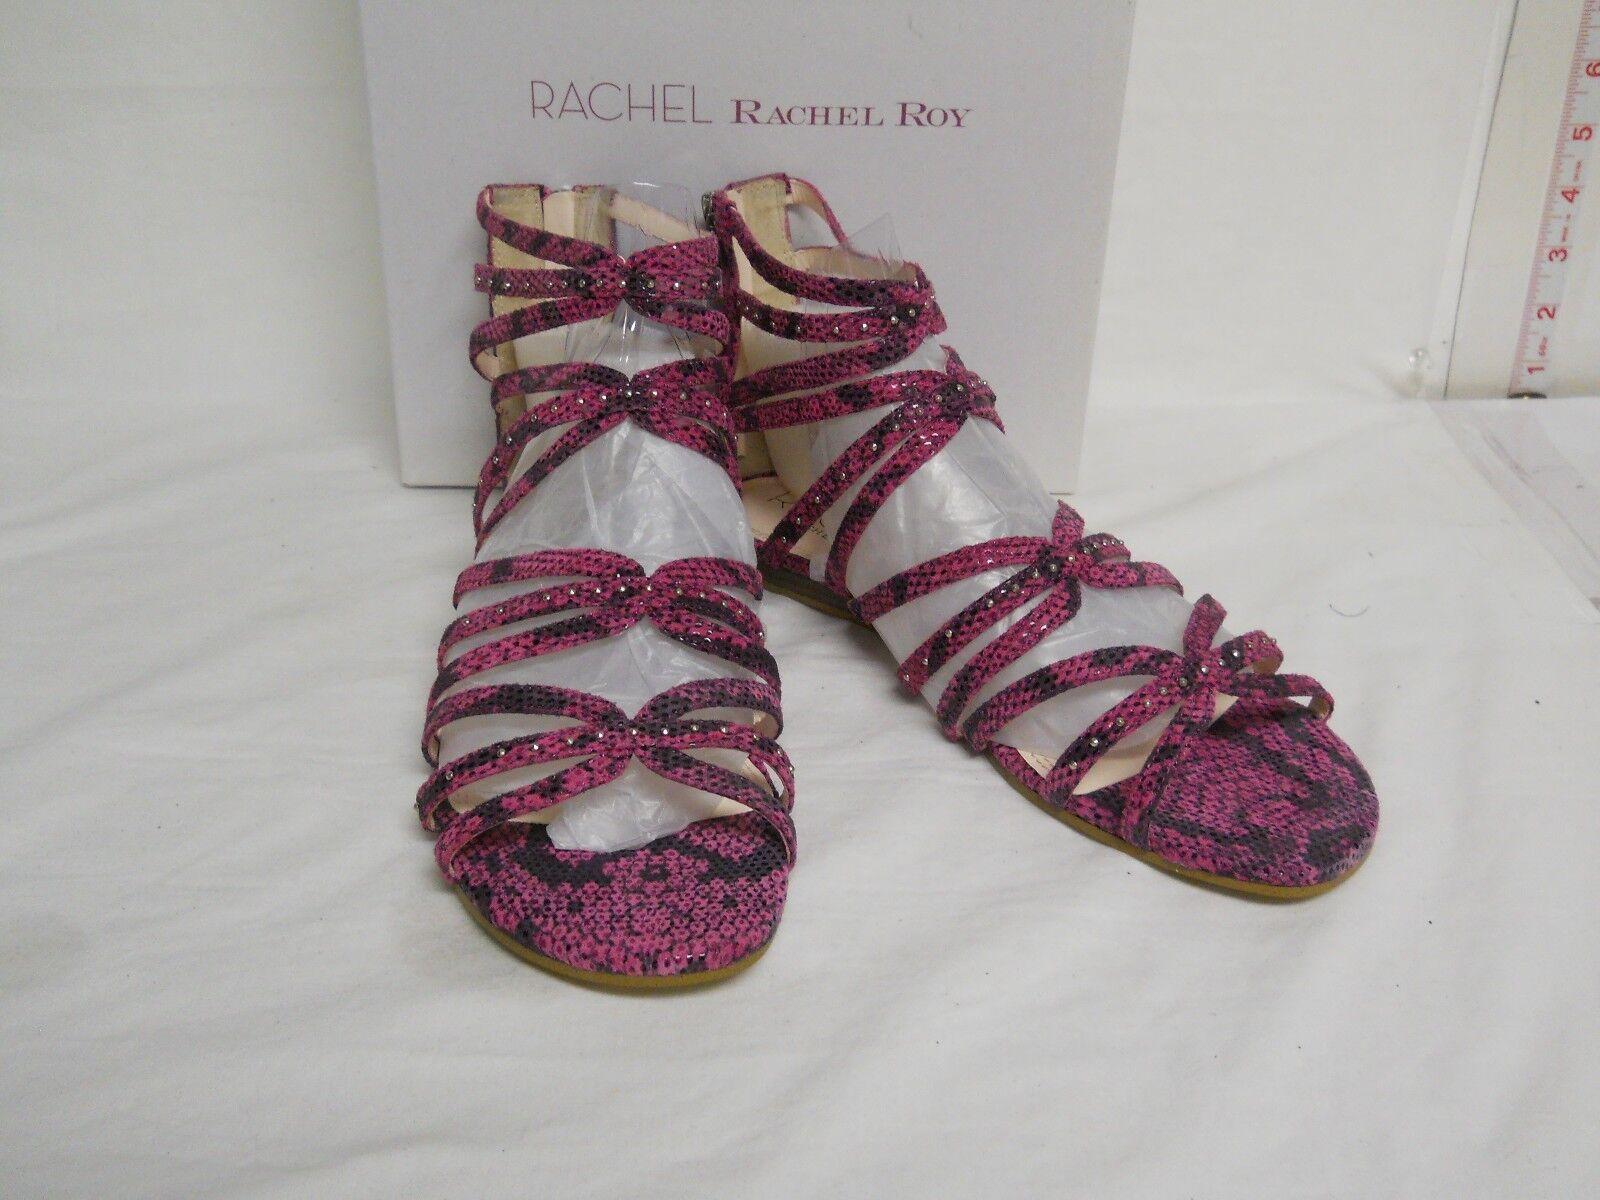 Rachel Roy New Womens Sitrus Pink Reptile Gladiator Sandals 7.5 M shoes